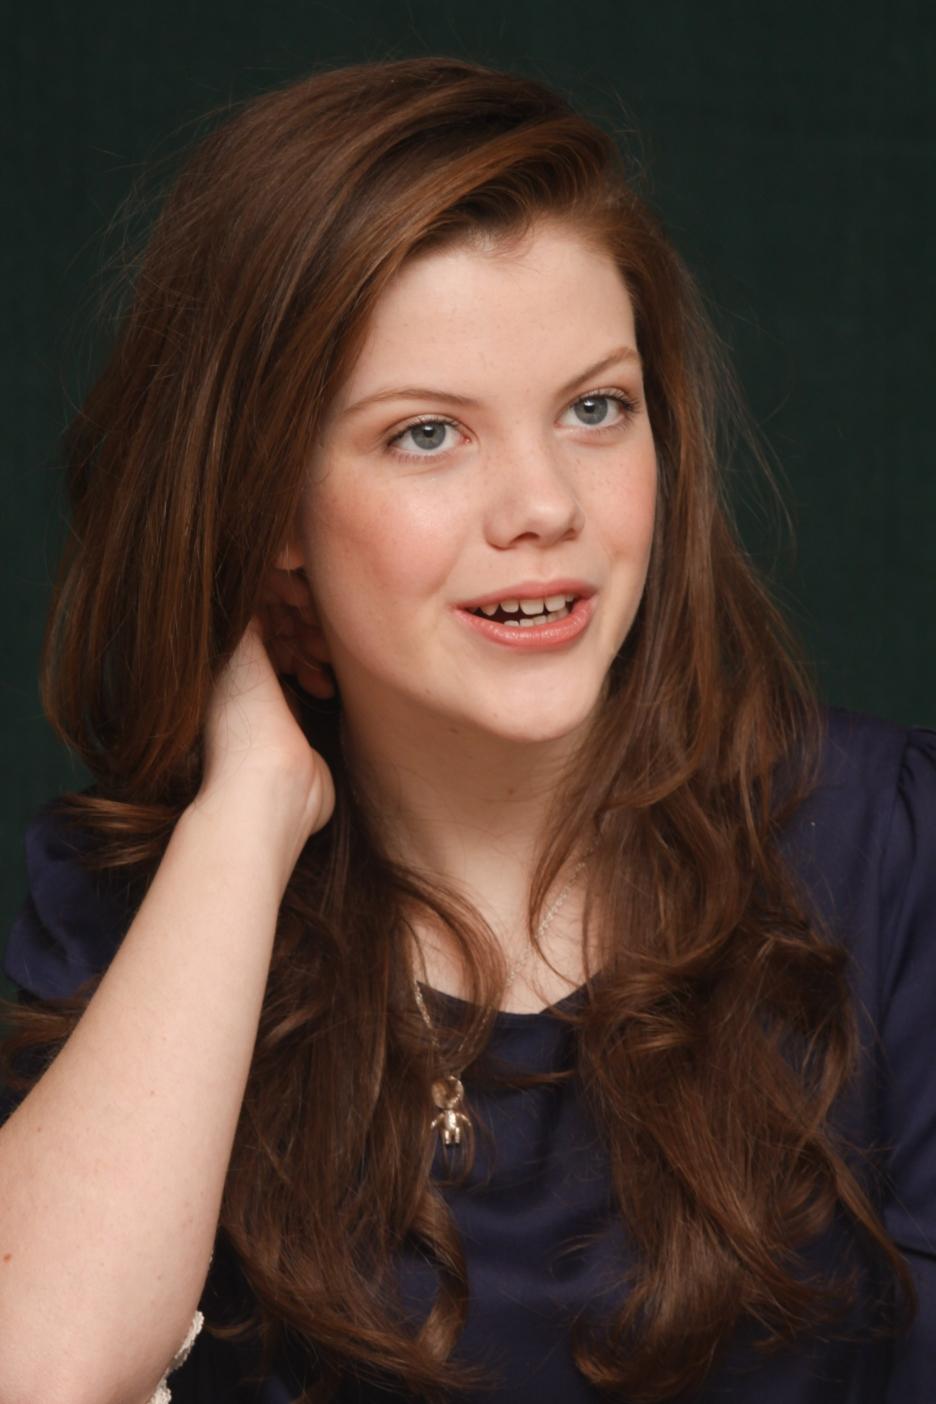 Georgie Henley (born 1995)